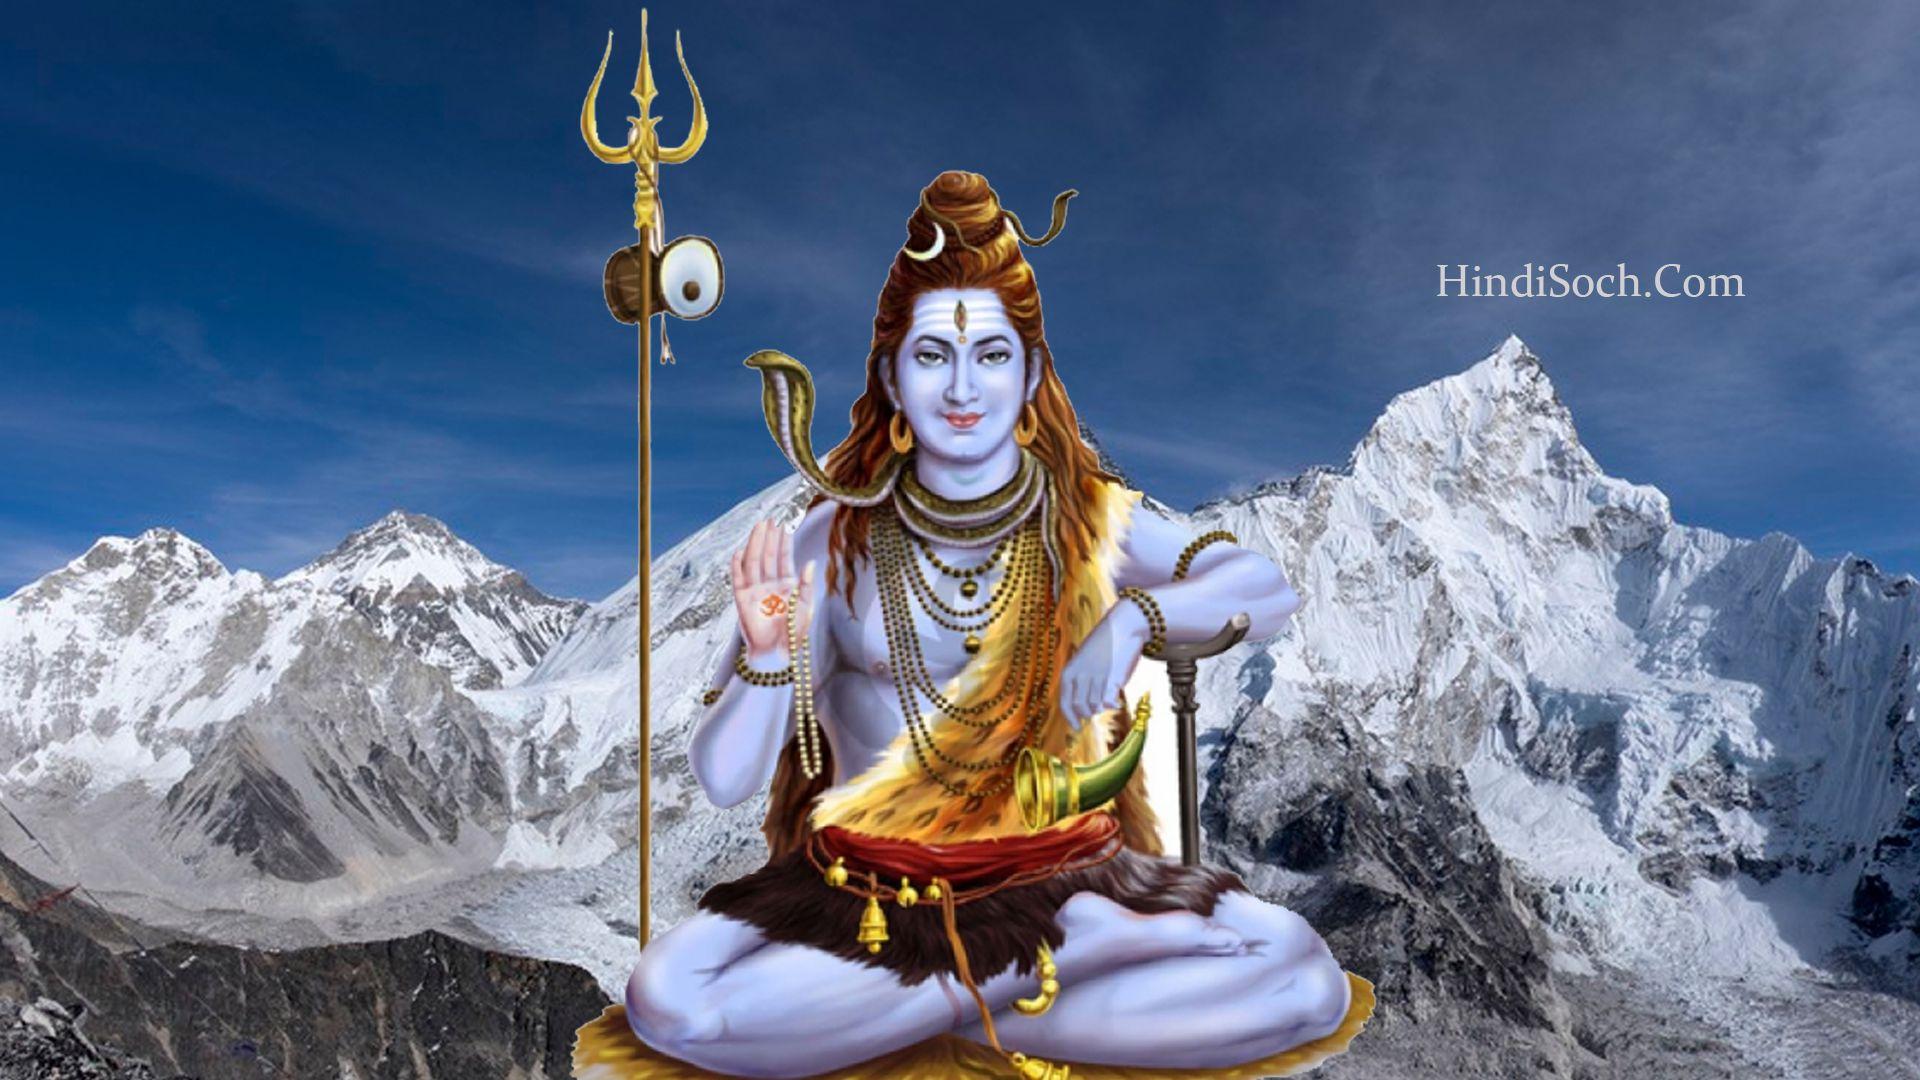 Lord Bhagwan Shiva Images